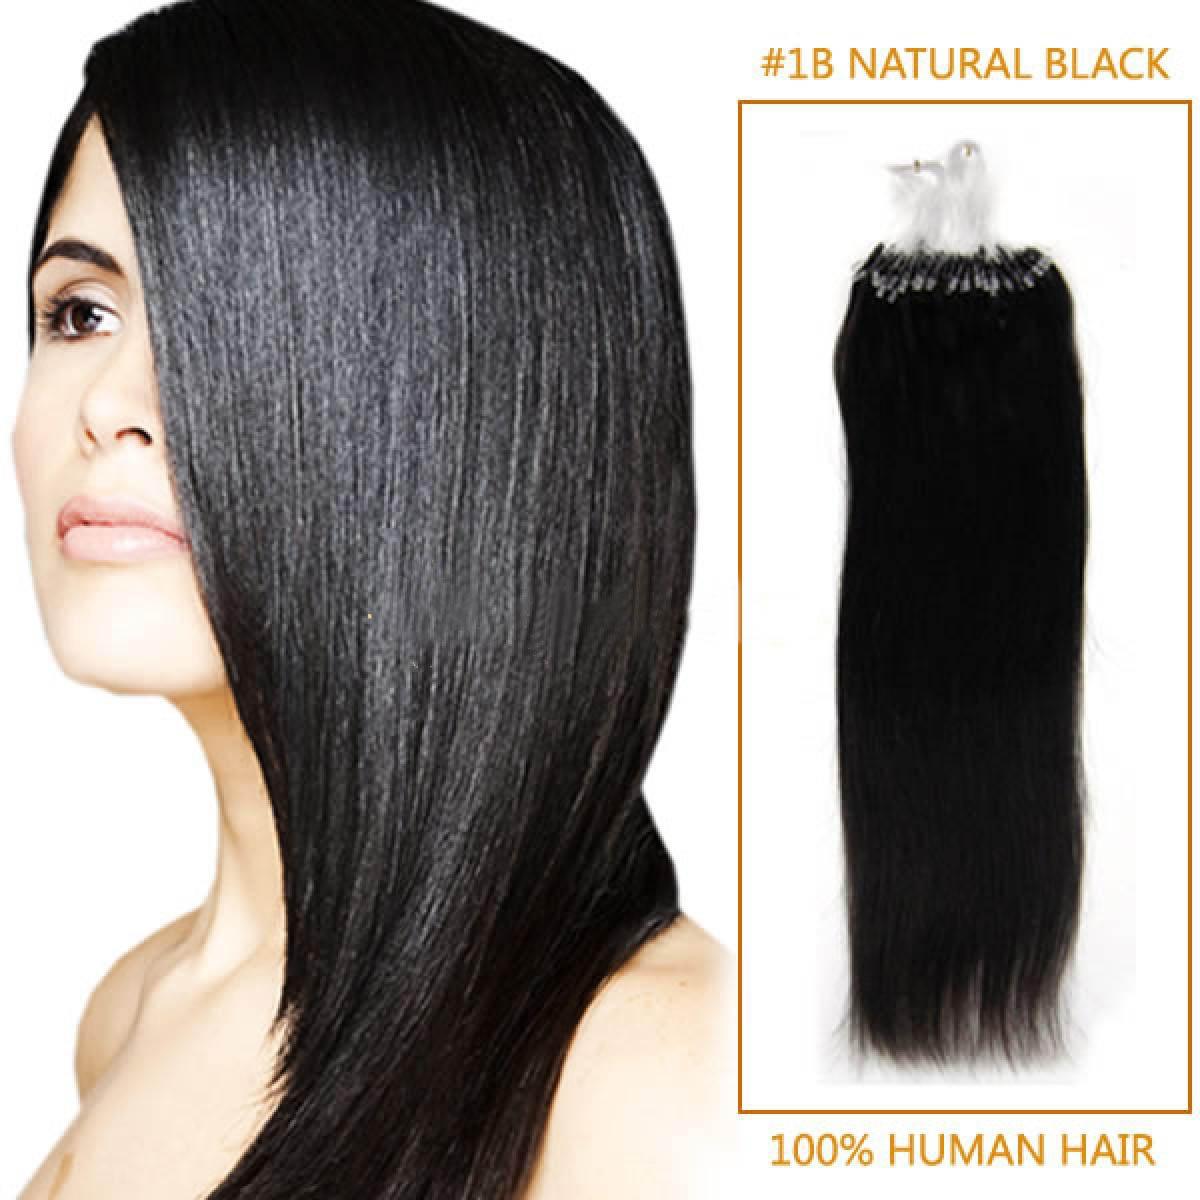 16 Inch 1b Natural Black Micro Loop Human Hair Extensions 100s 100g